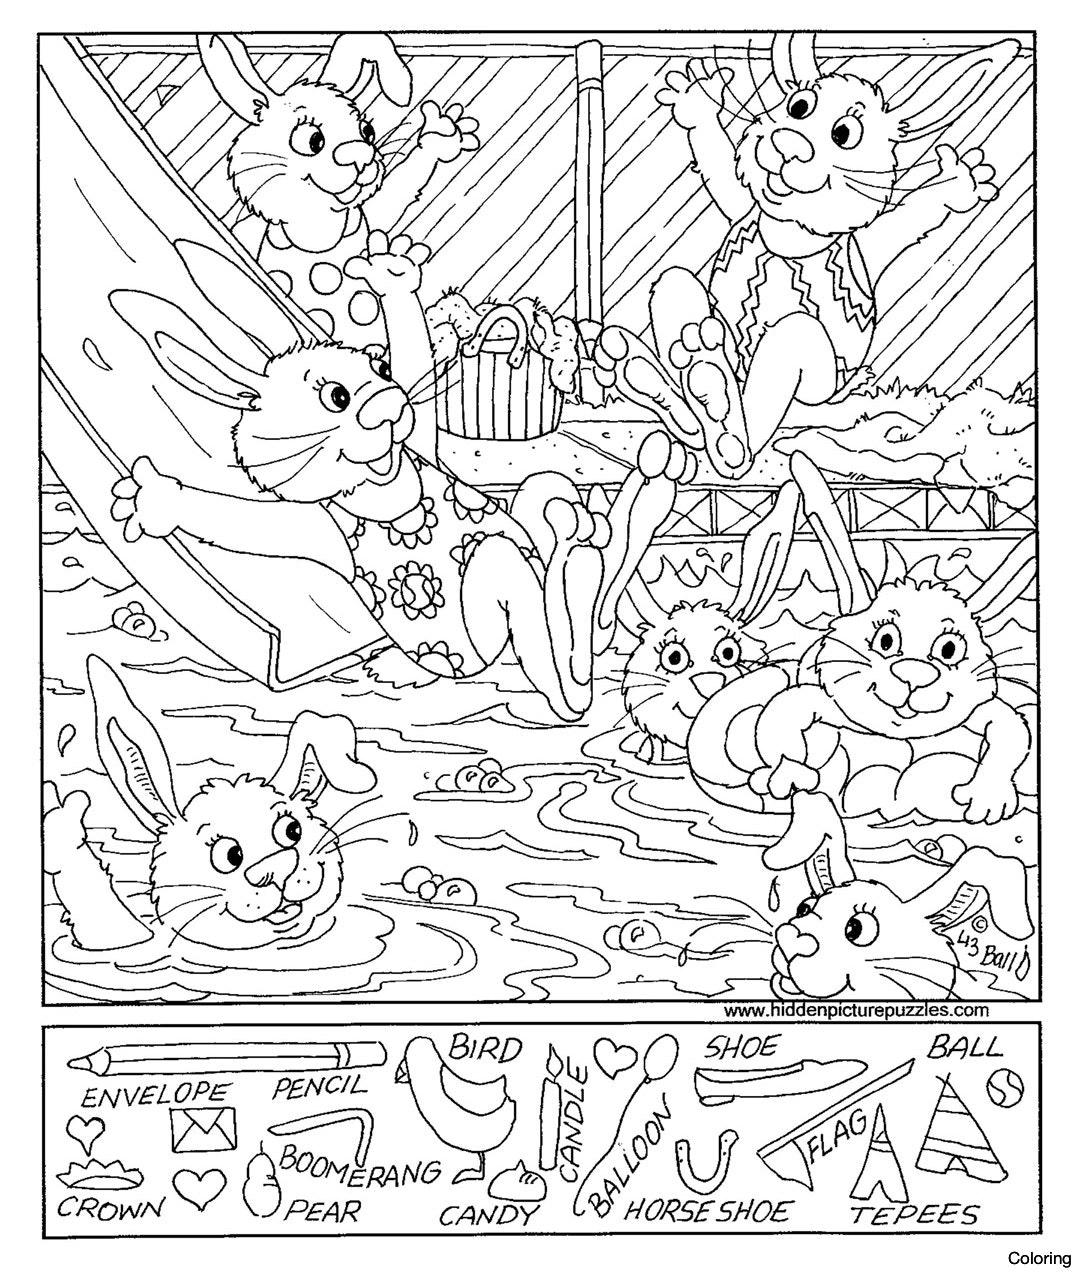 1082x1274 Highlights Hidden Pictures Pdf Coloring Printable Diaiz